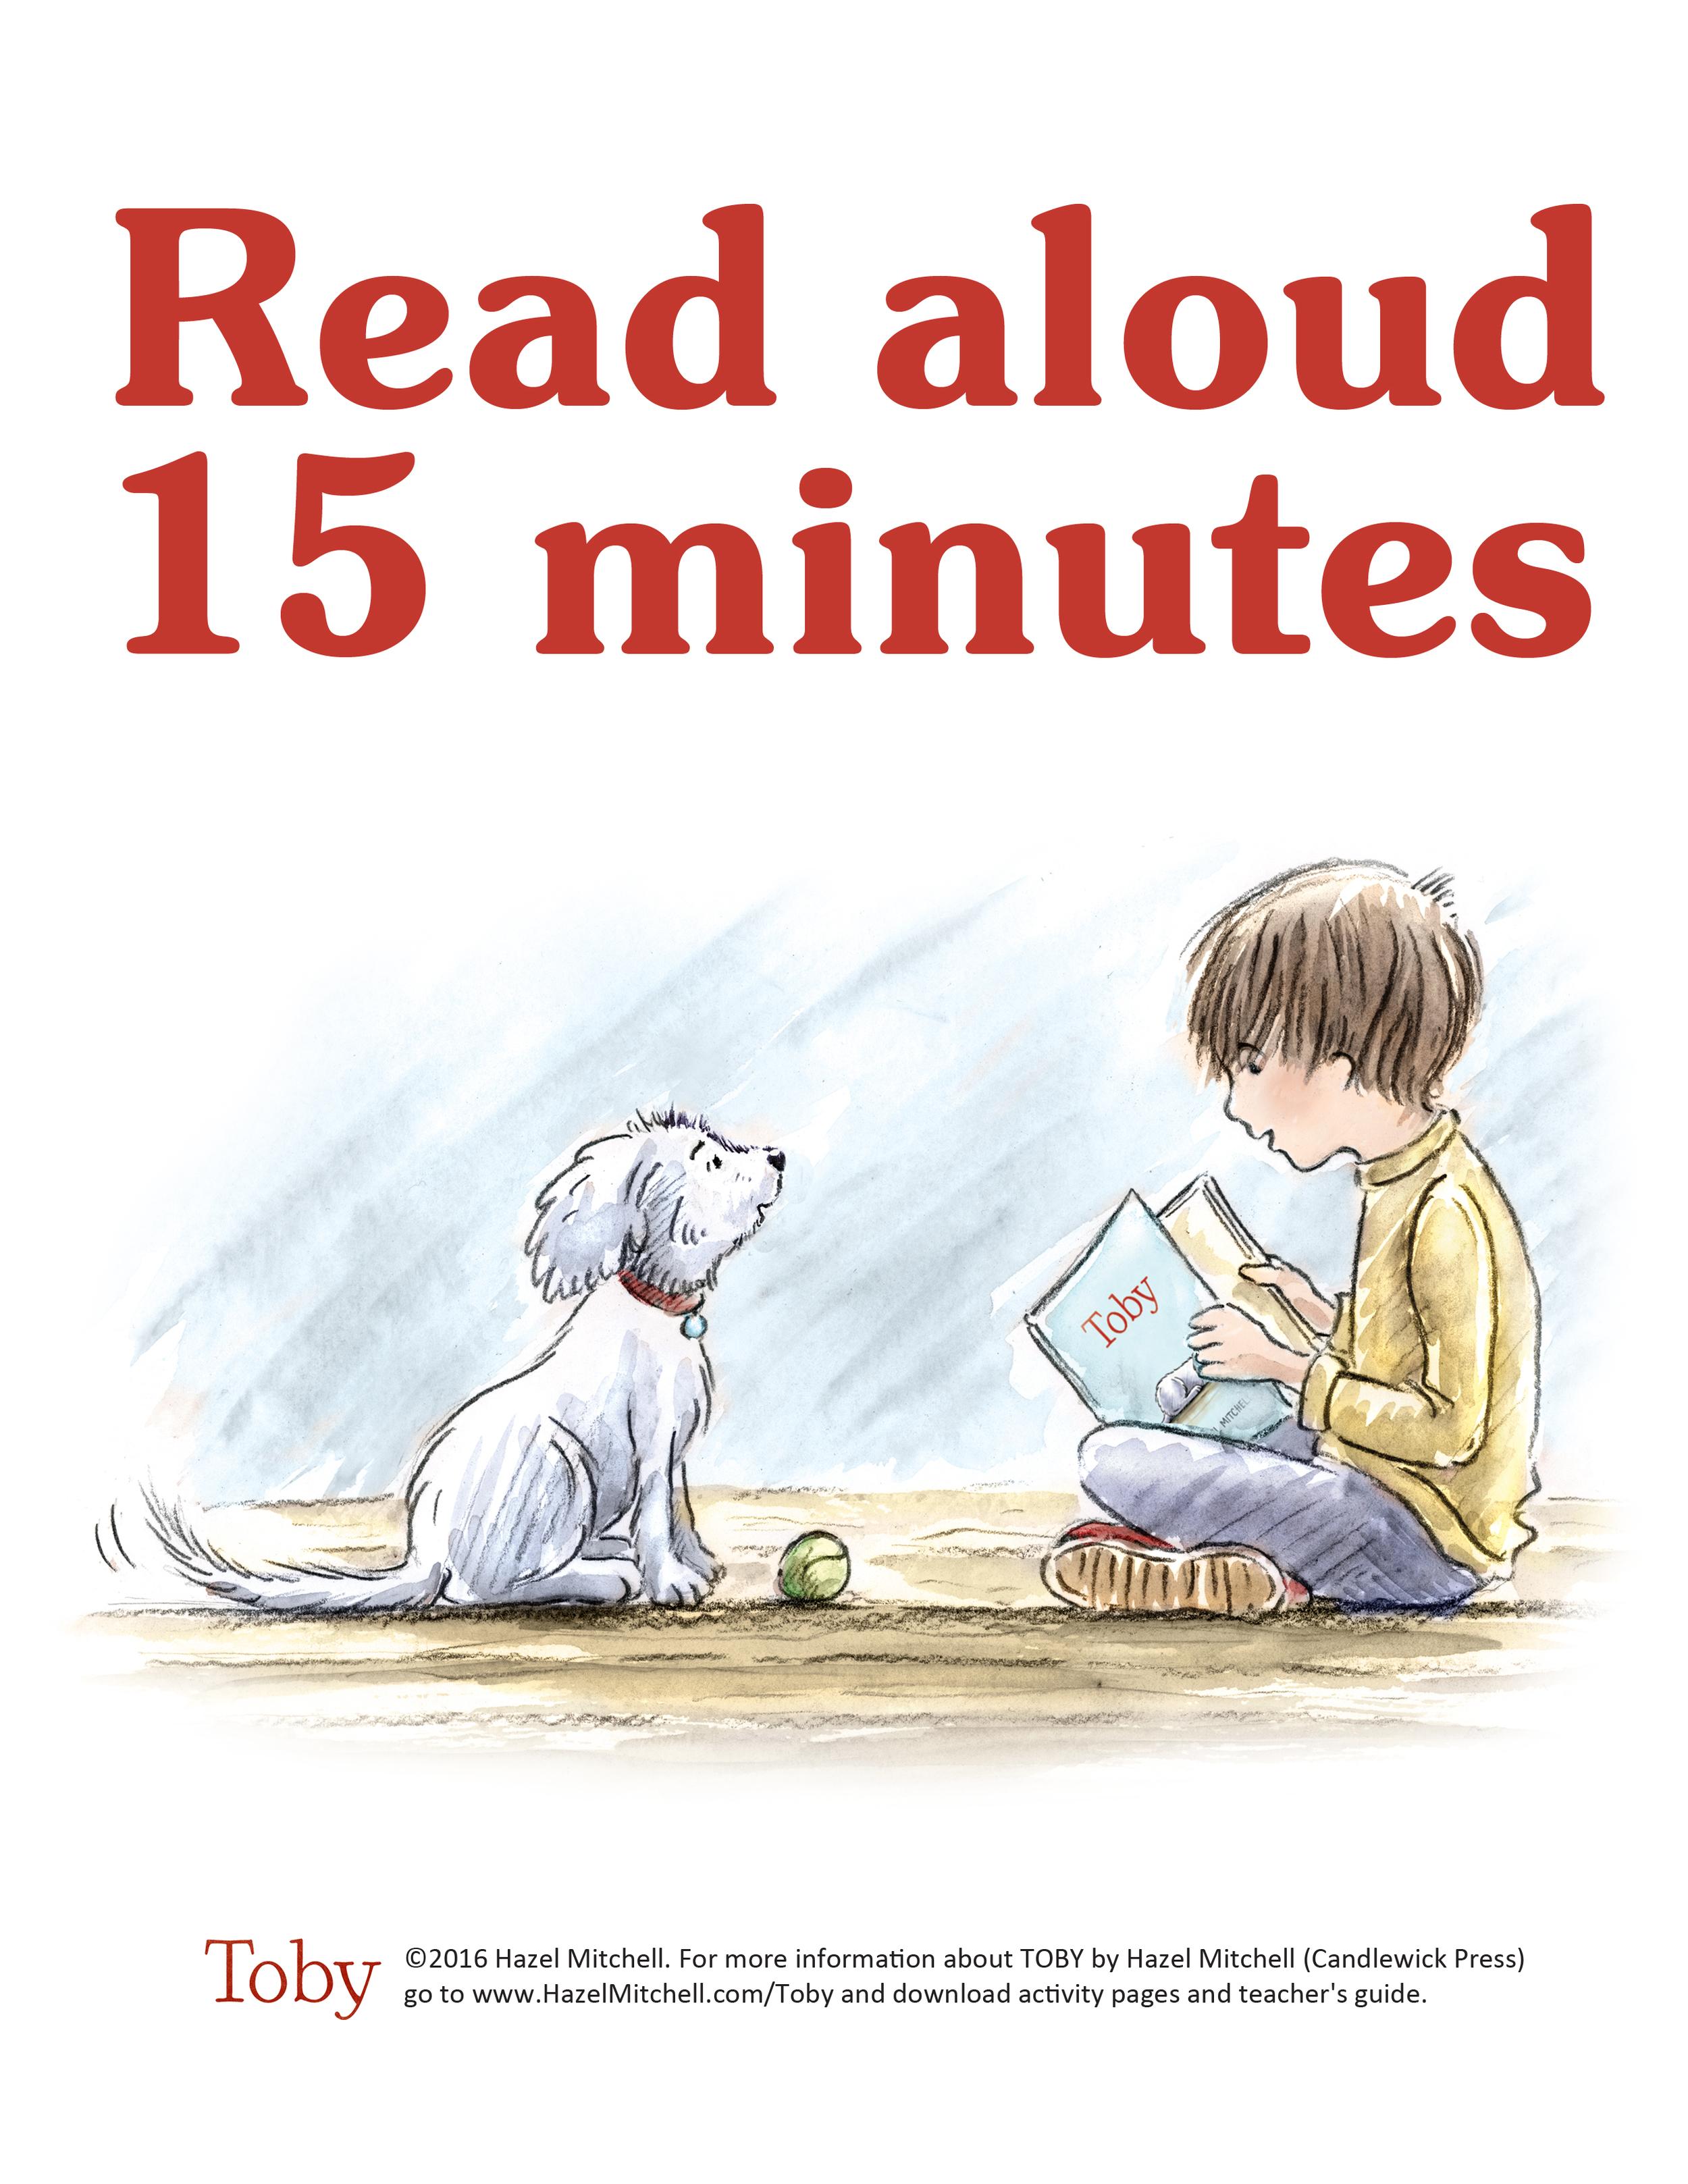 Read aloud 15 minutes